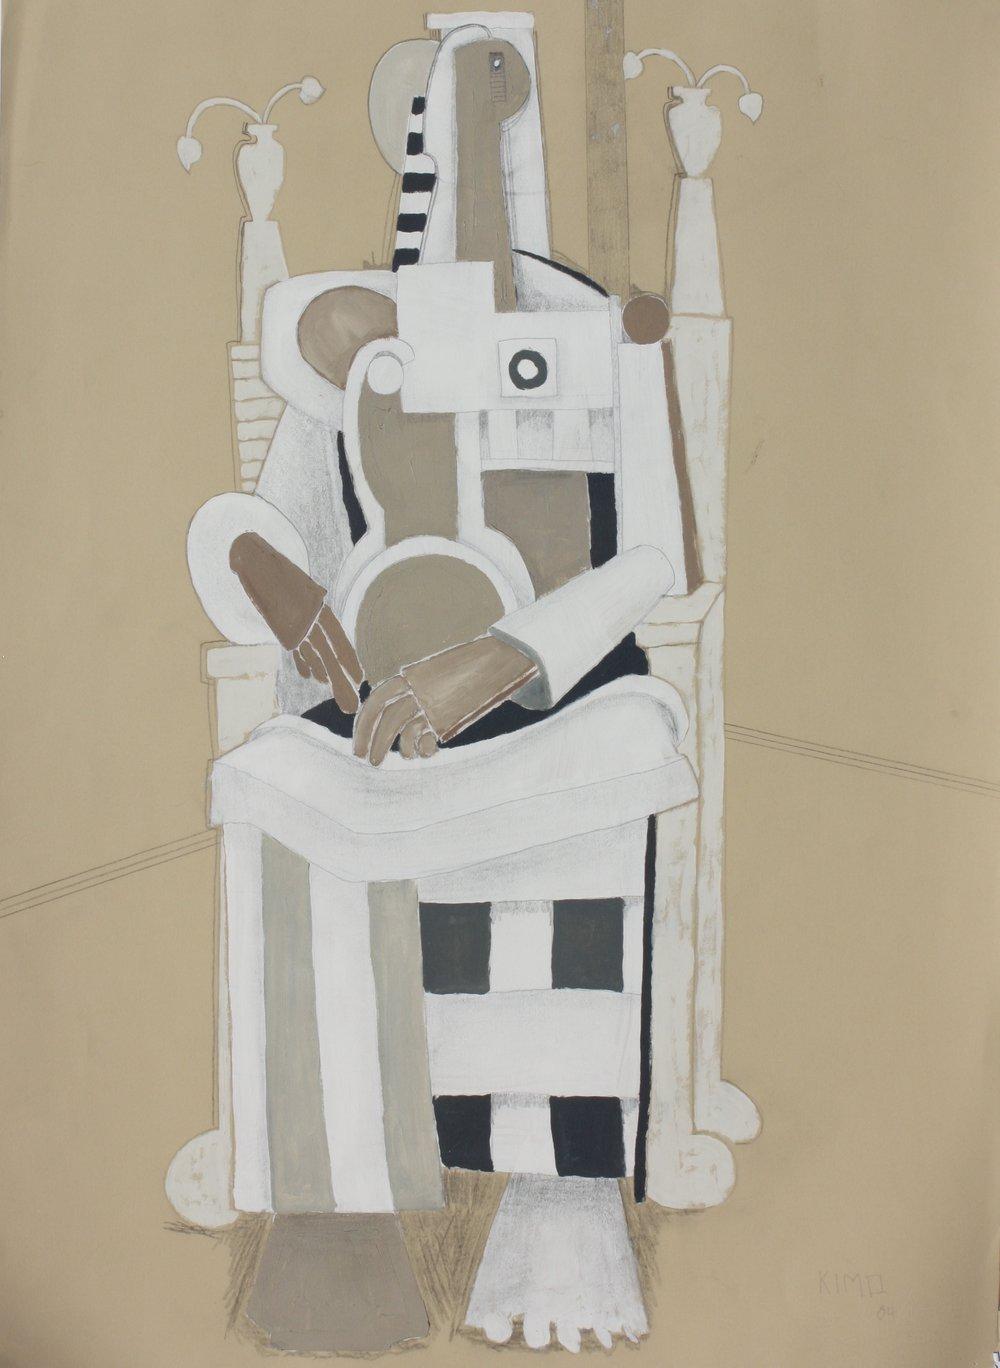 Big Chair #3